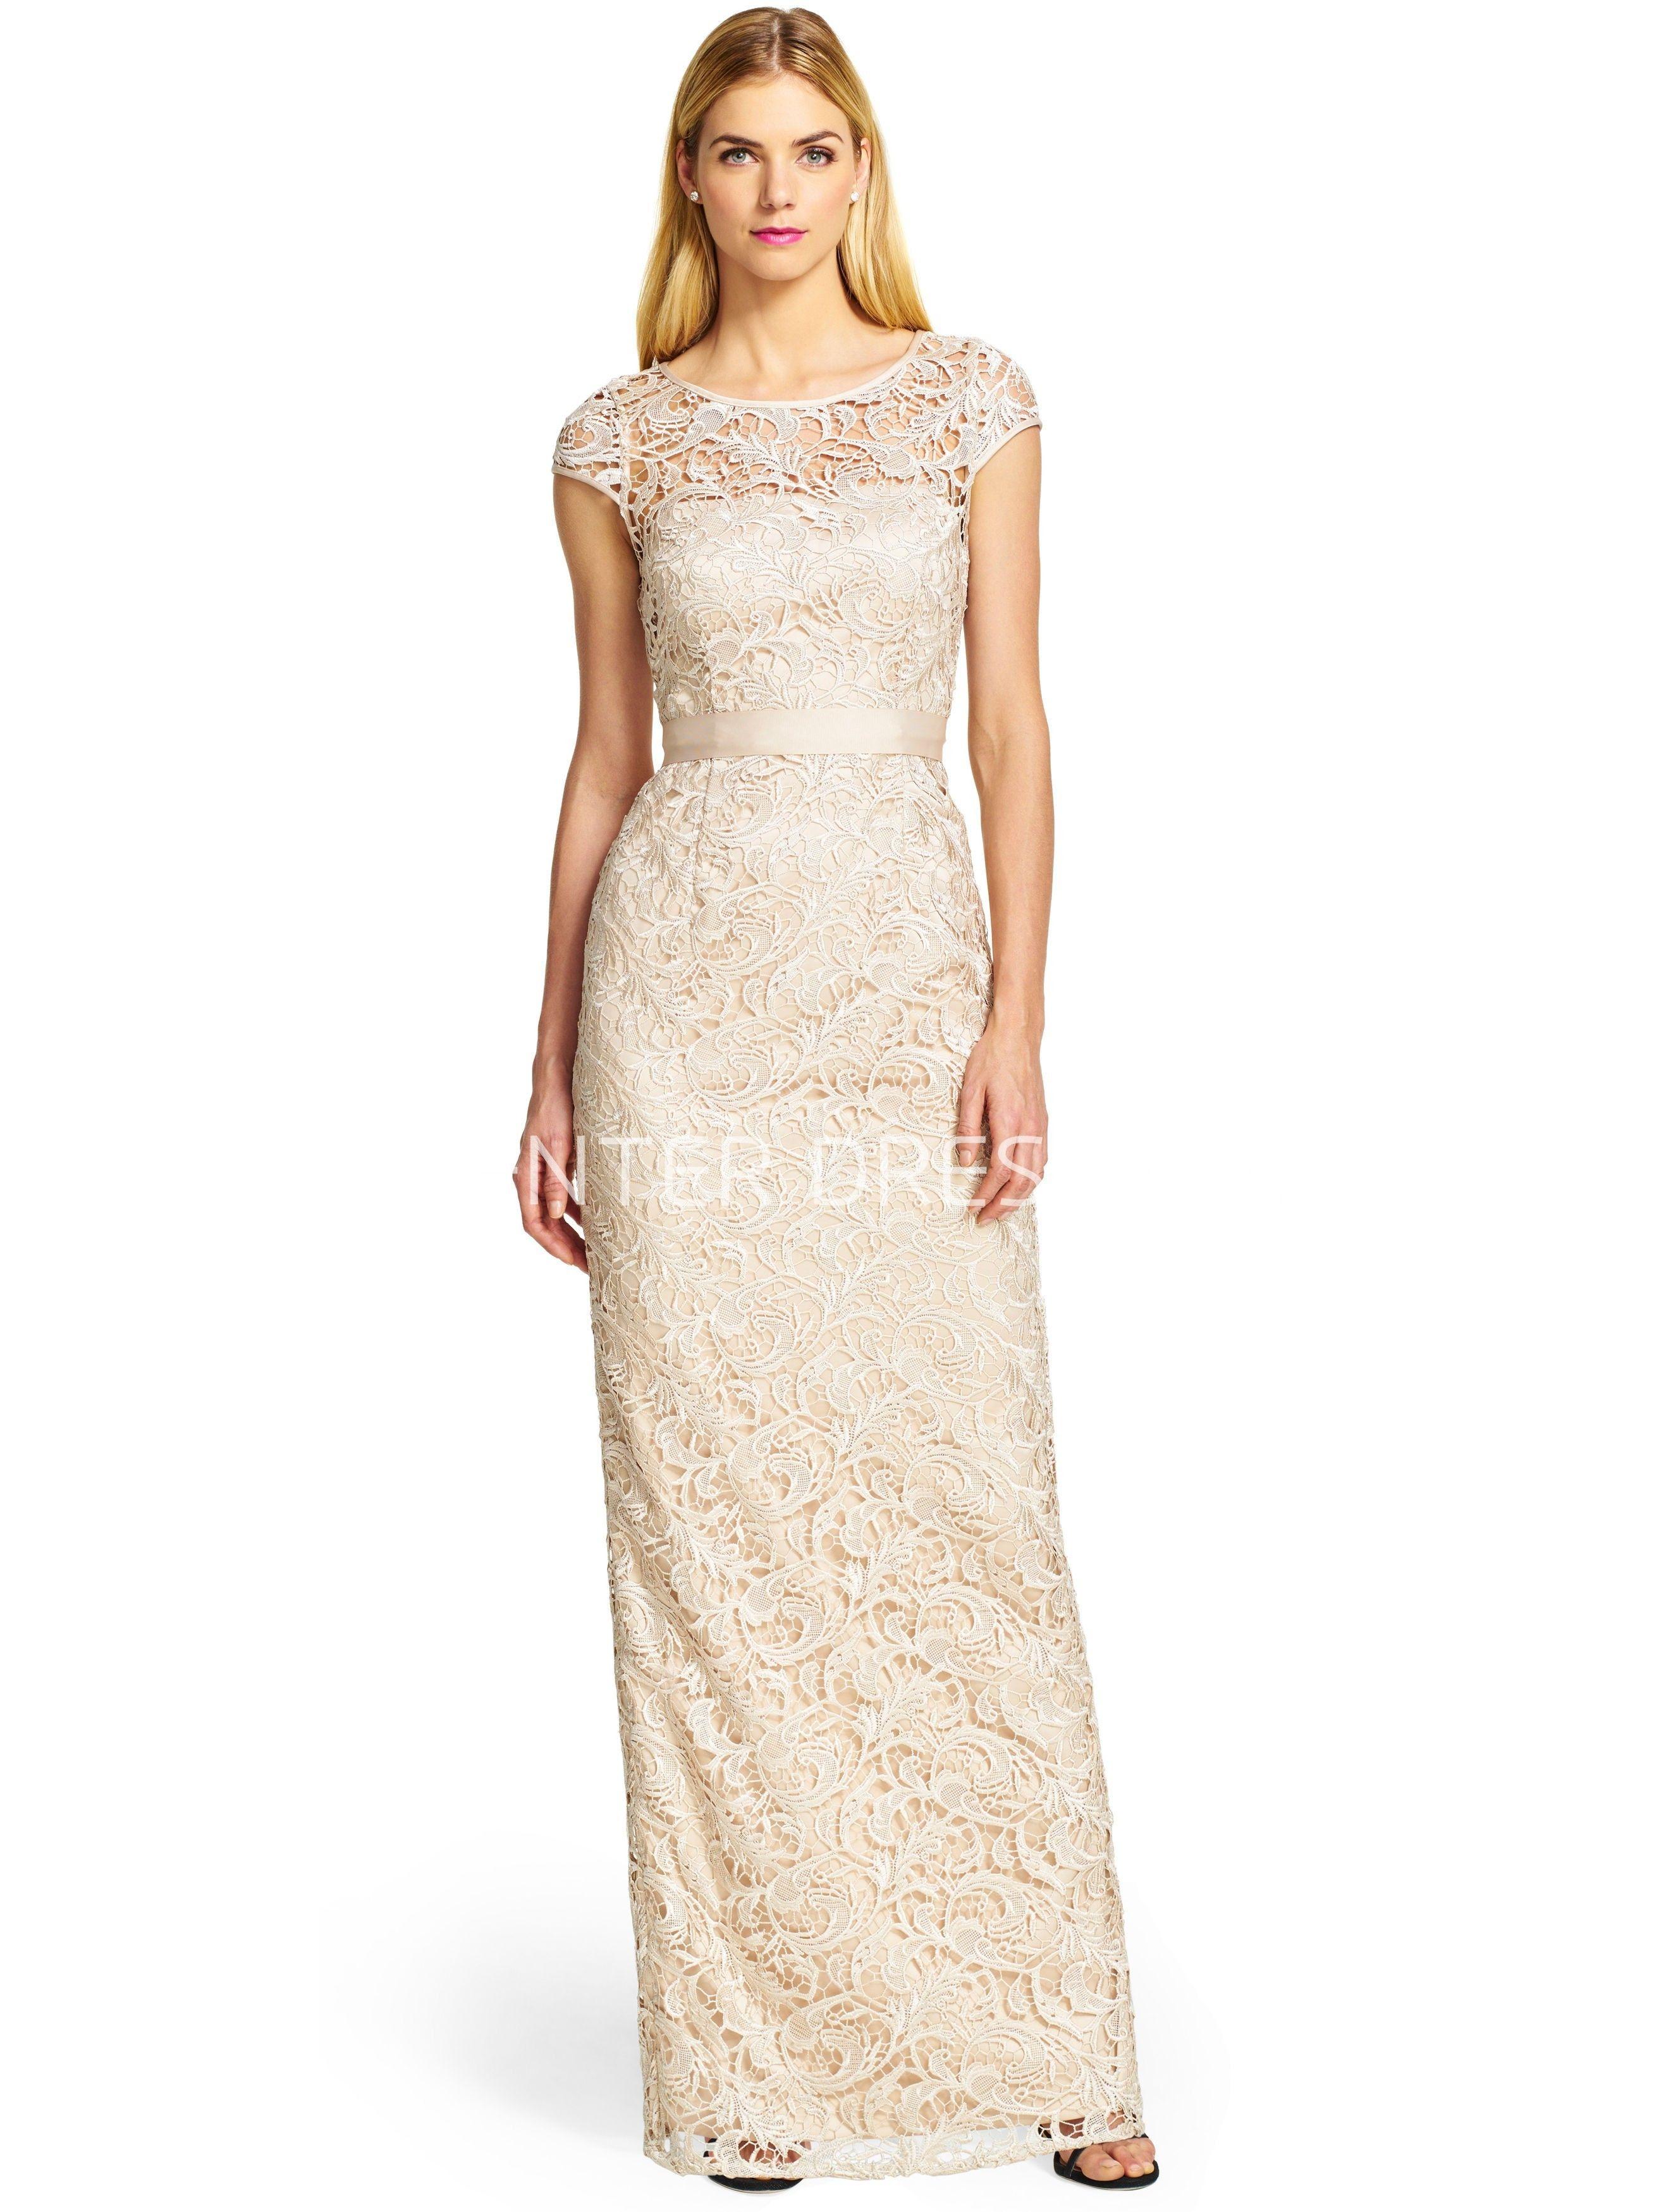 $130.69-Elegant Sheath Scoop Neck Cap Sleeve Bowed Lace Bridesmaid Dress. http://www.ucenterdress.com/sheath-floor-length-scoop-neck-cap-sleeve-bowed-lace-bridesmaid-dress-pMK_100185.html.  Shop for long dresses, designer dresses, casual dresses, occasion dresses, backless dresses, elegant dresses, black tie dresses, We have great 2016 fall bridesmaid dress for sale. Avialble in Gold, Yellow, Pink, Lavender Burgundy, Peach…#UCenterDress.com